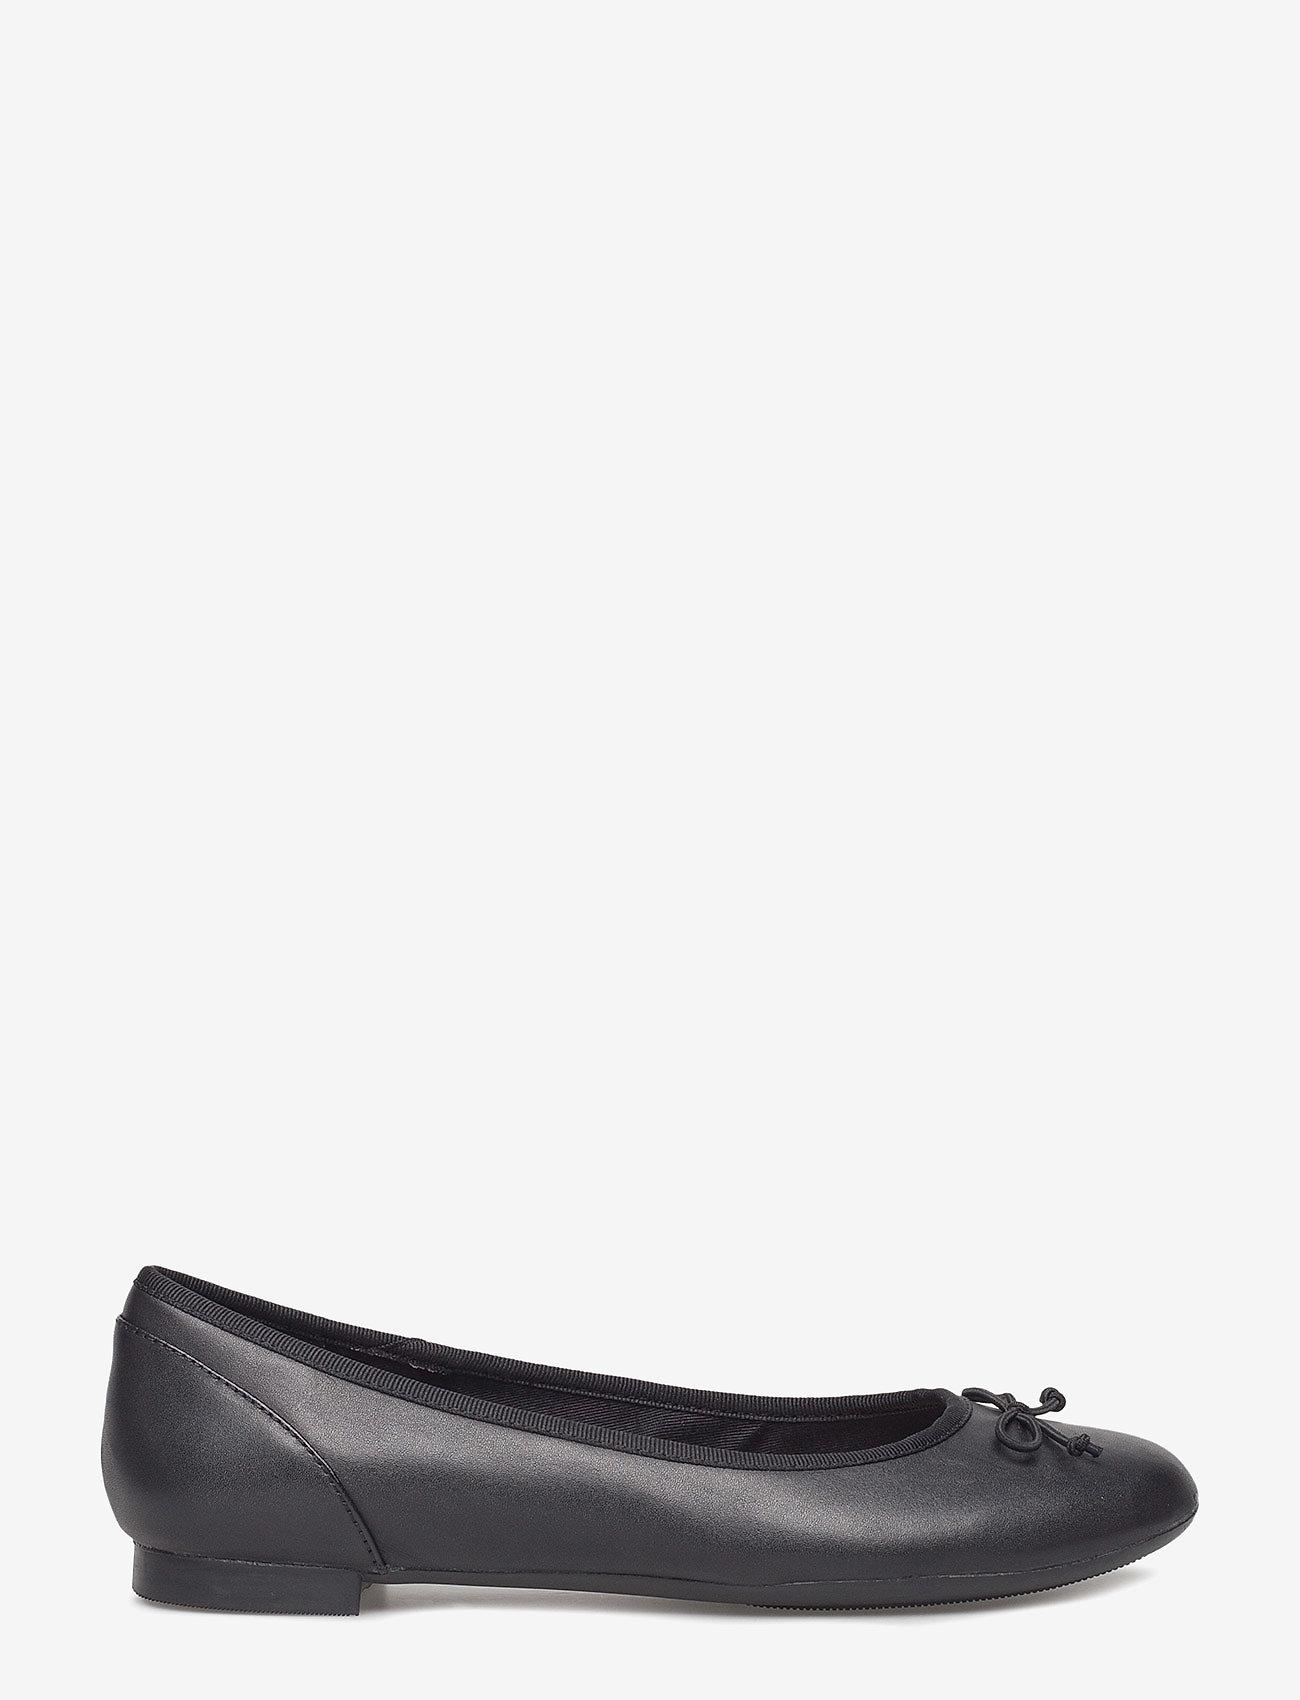 Clarks - Couture Bloom - ballerinasko - black leather - 1